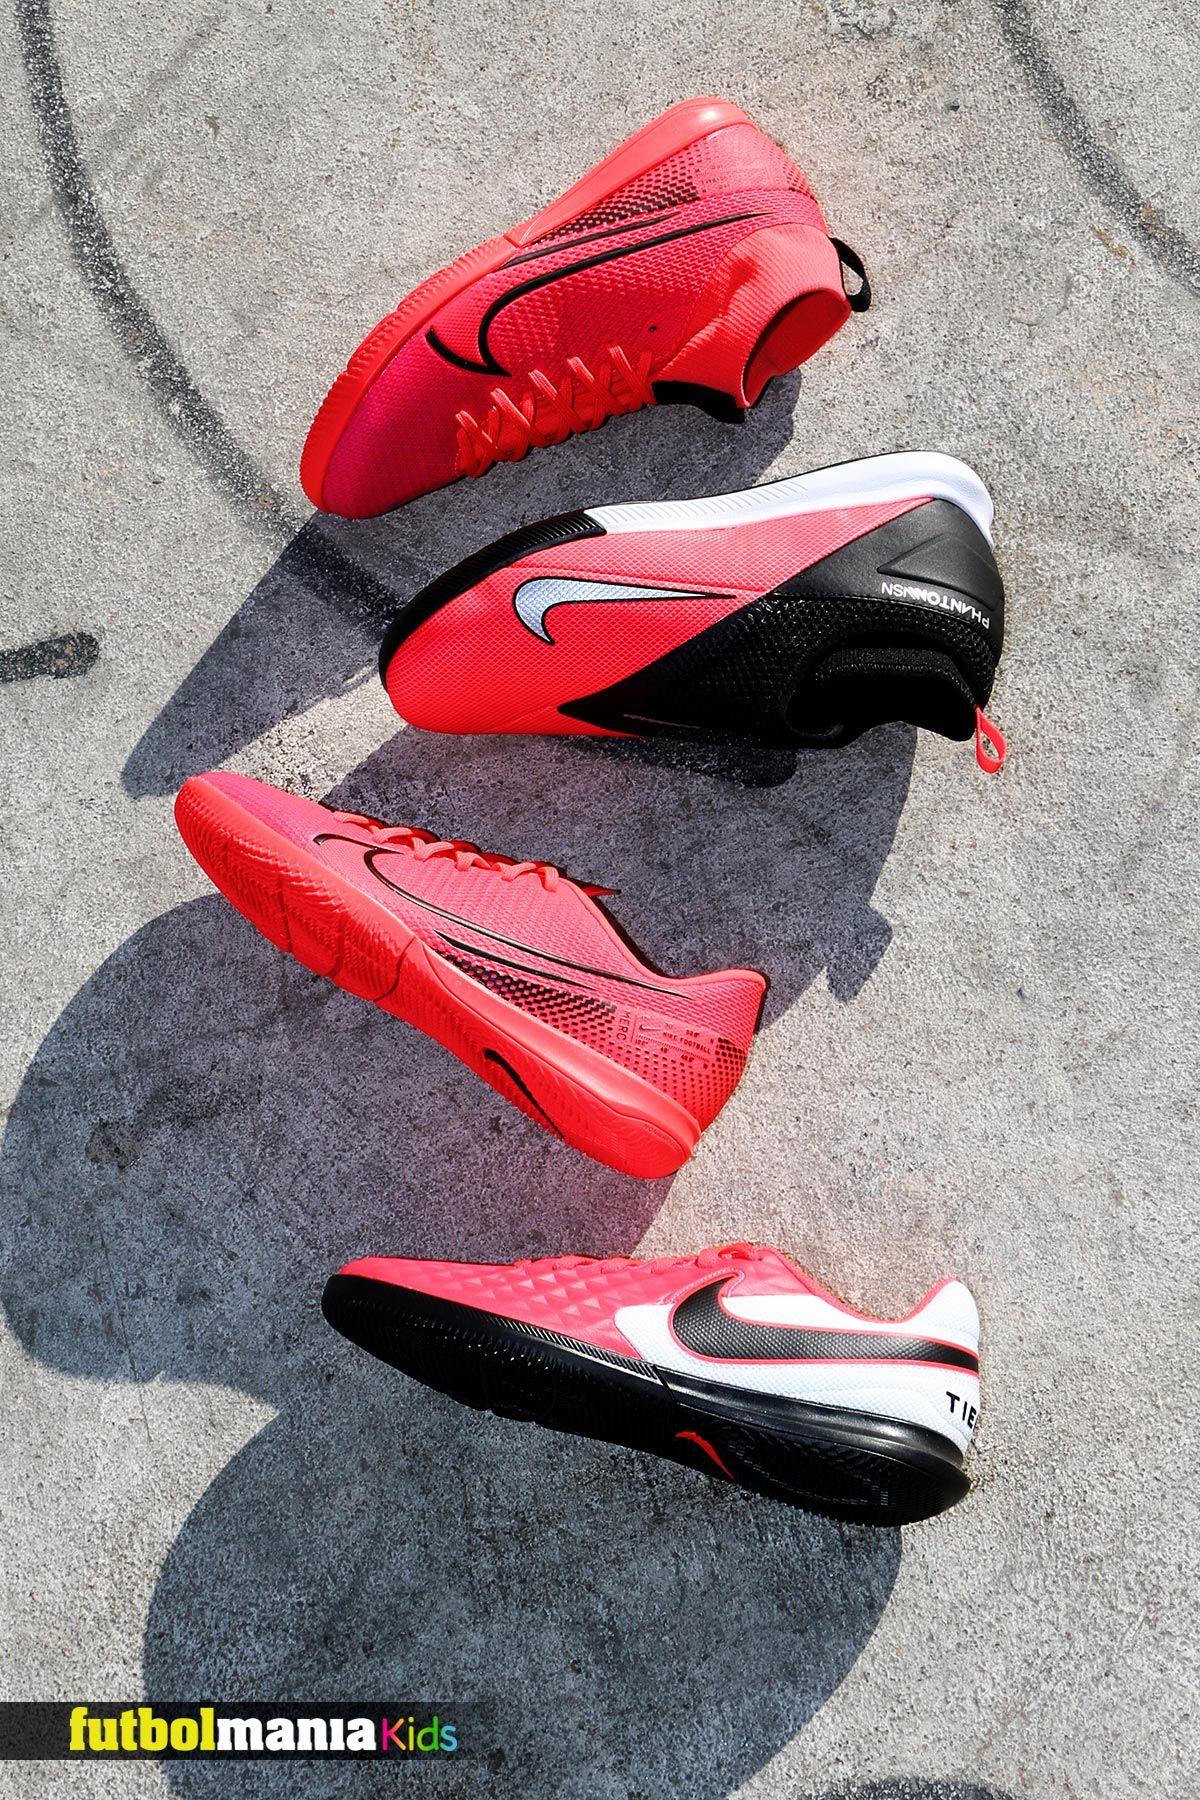 Nike fútbol sala en 2020 | Botas de futbol sala, Zapatos de ...